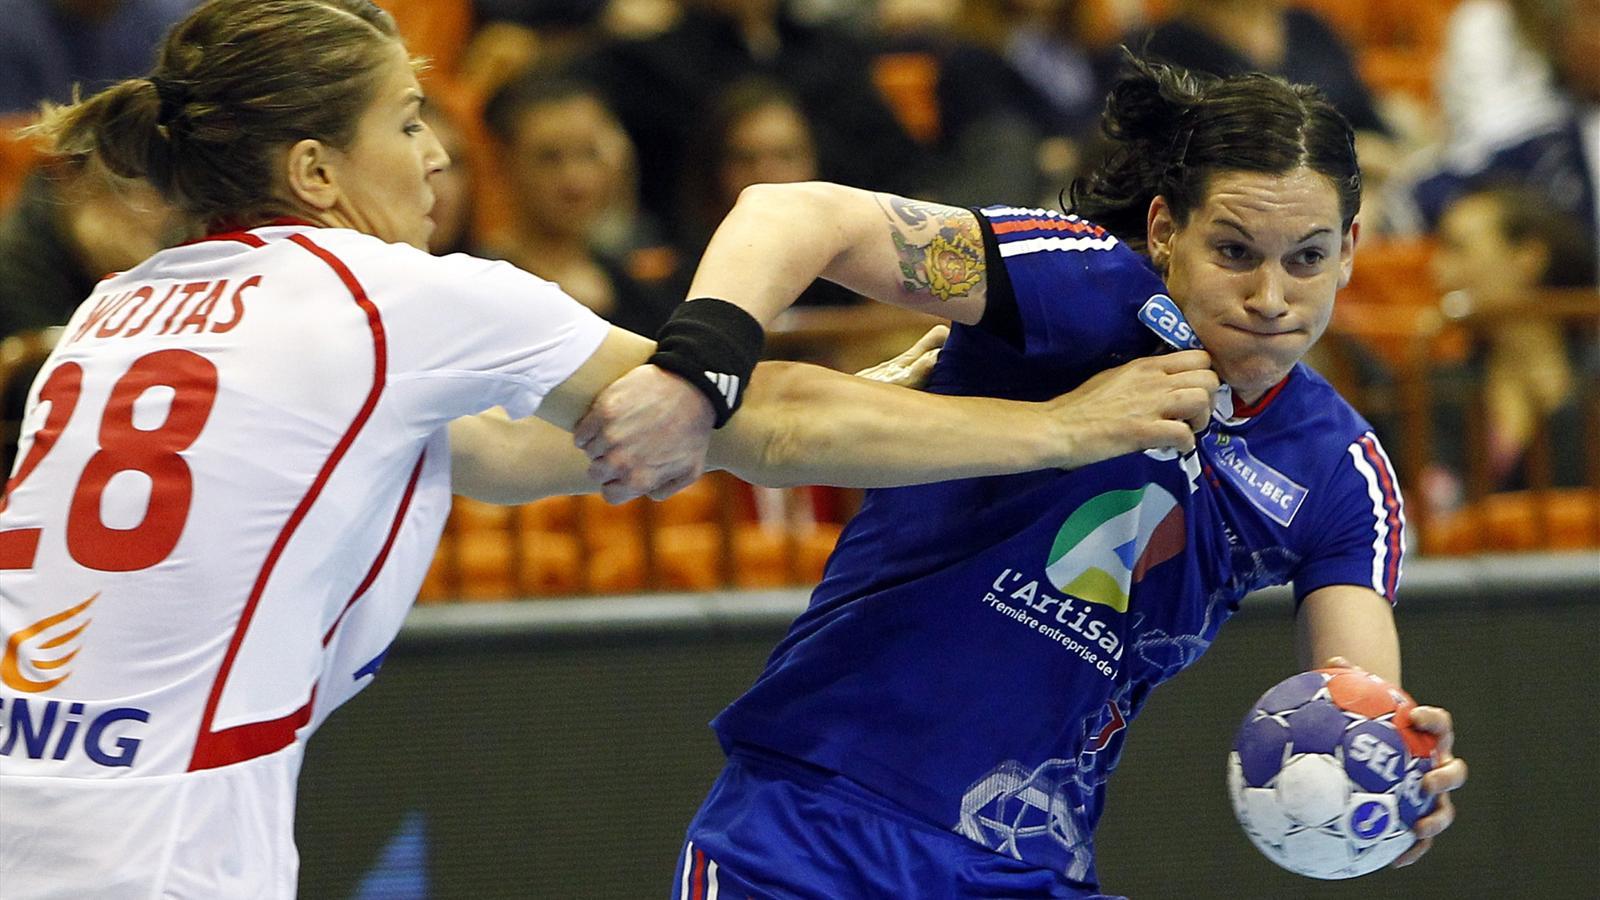 Handball mondial f minin la france limin e en quarts de finale par la pologne 21 22 - Coupe du monde handball 2013 ...